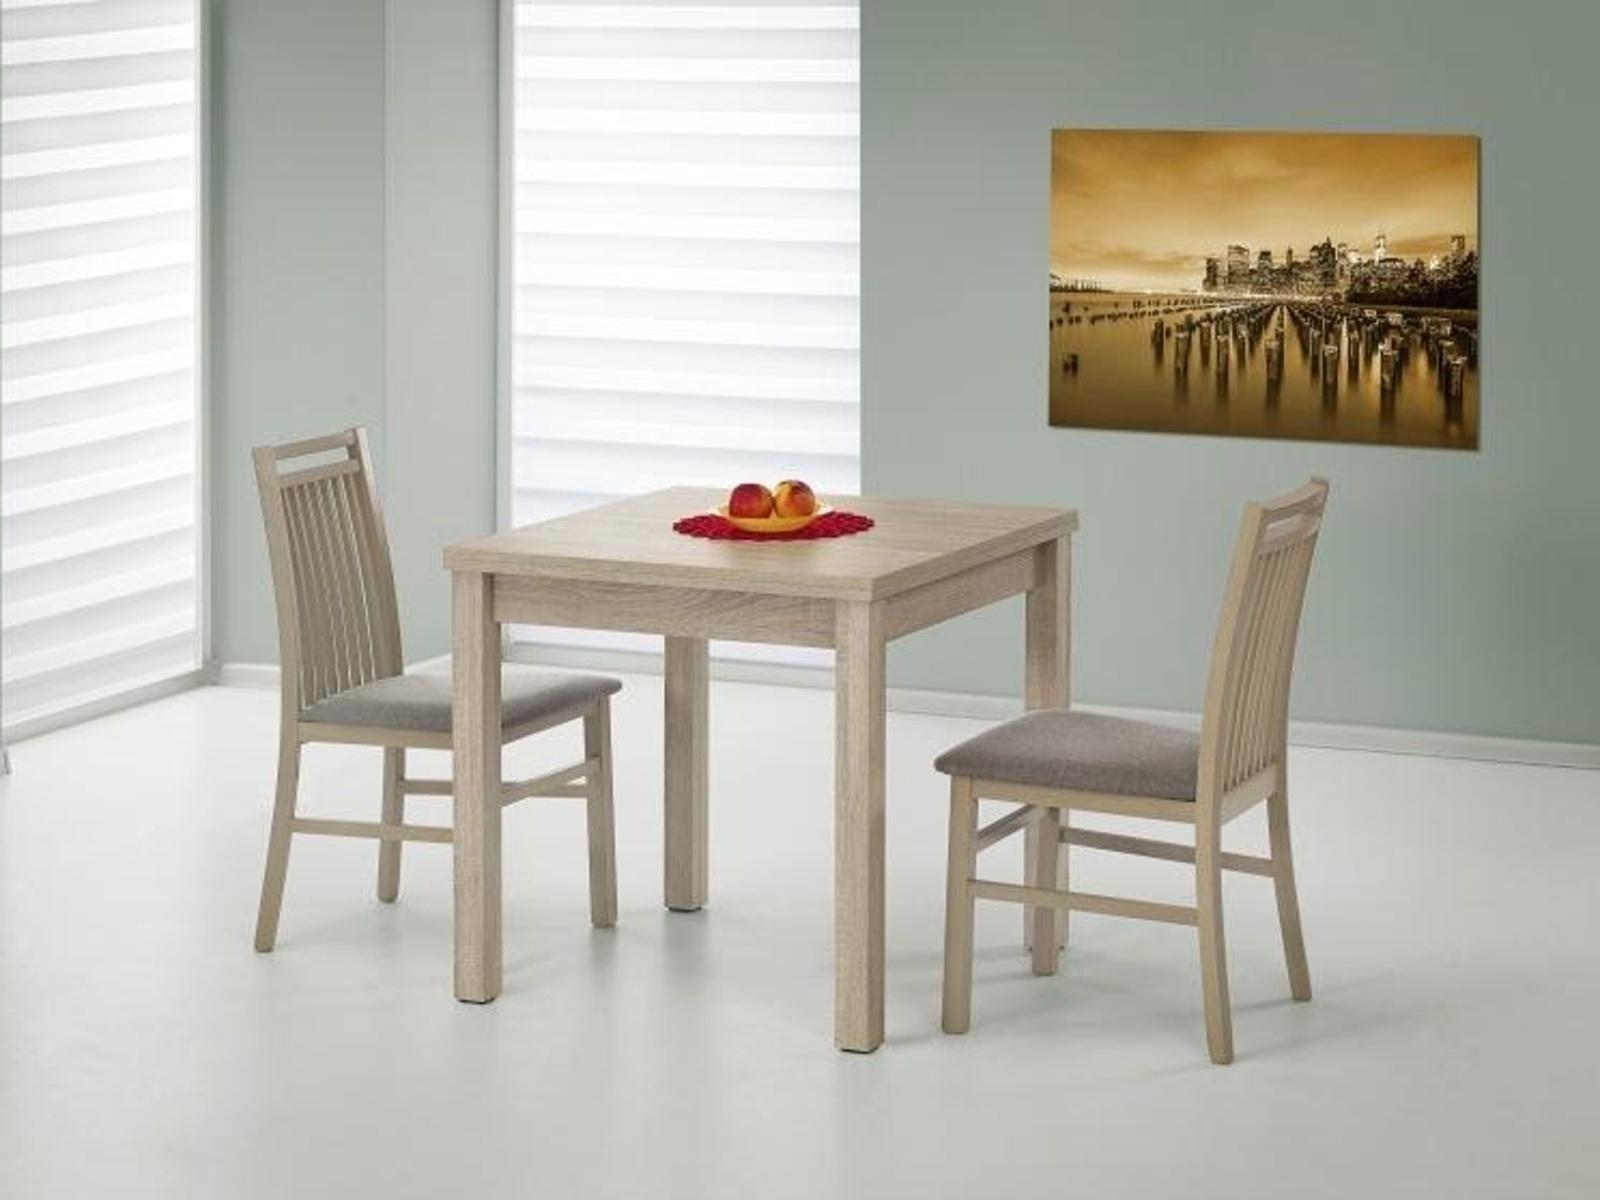 Halmar Jídelní stůl rozkládací GRACJAN, dub sonoma